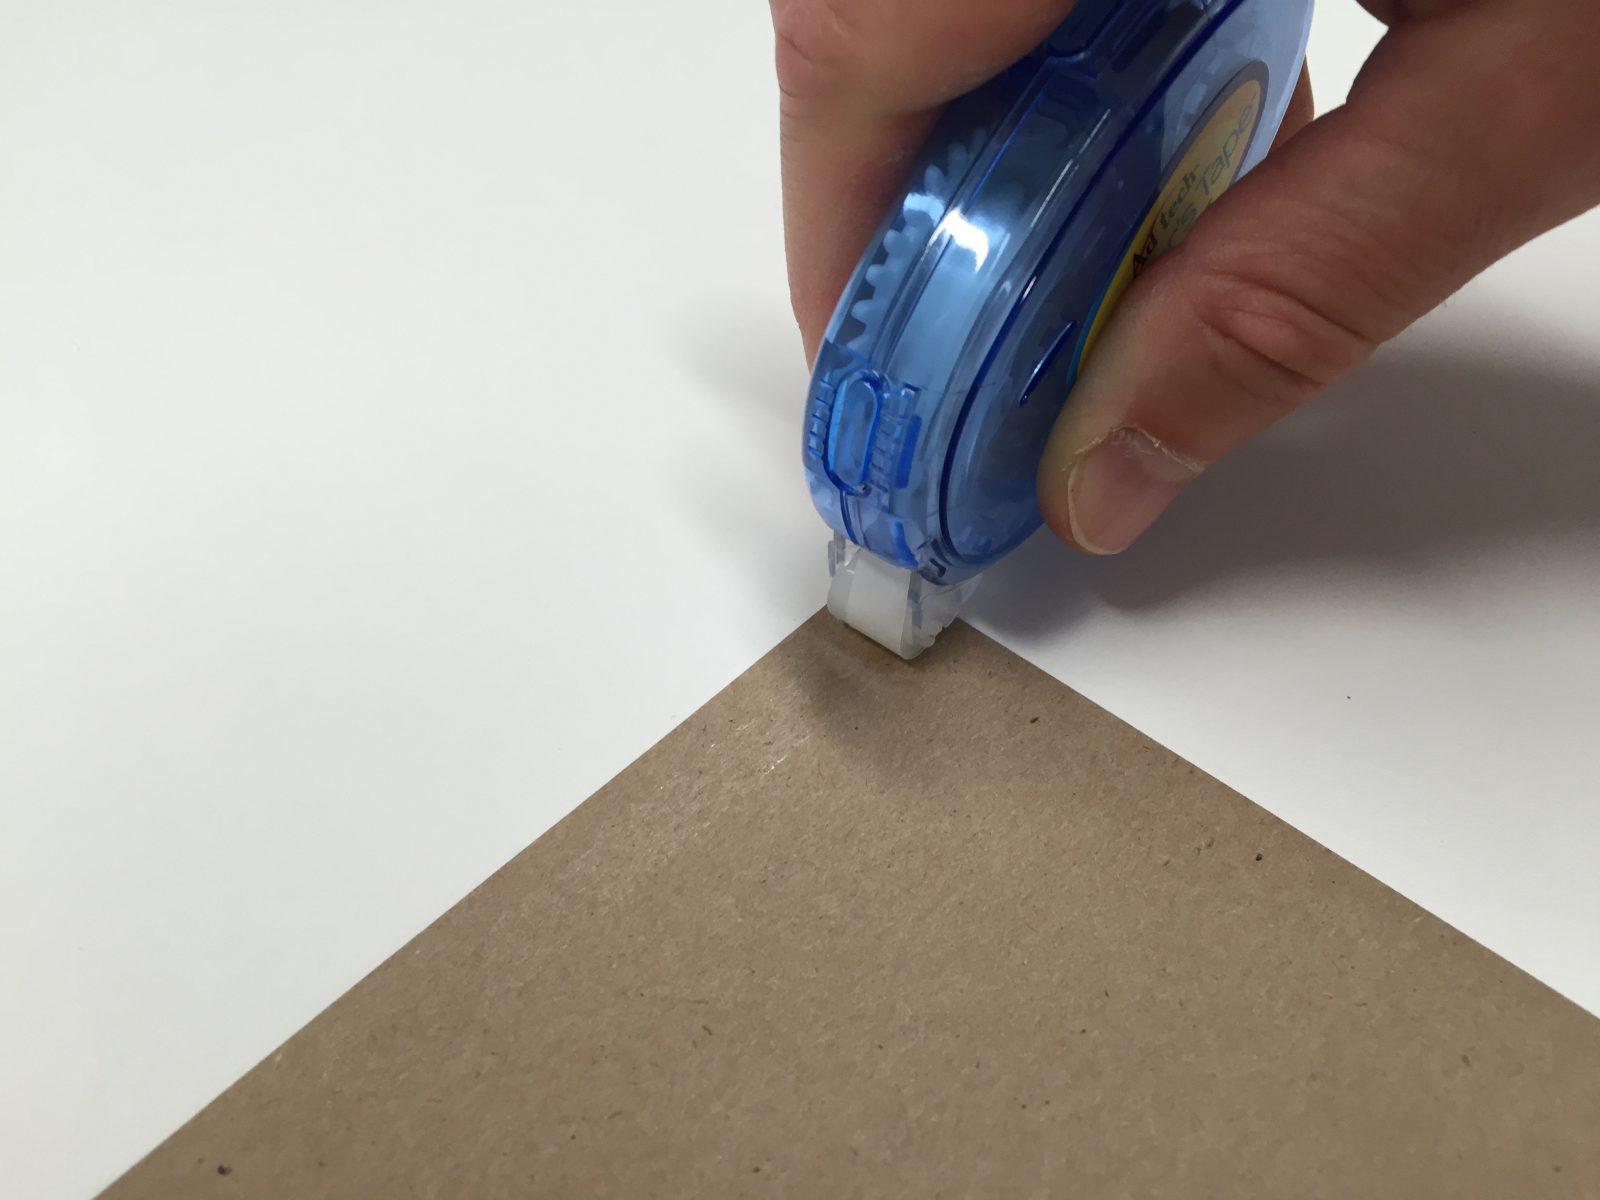 Using glue tape